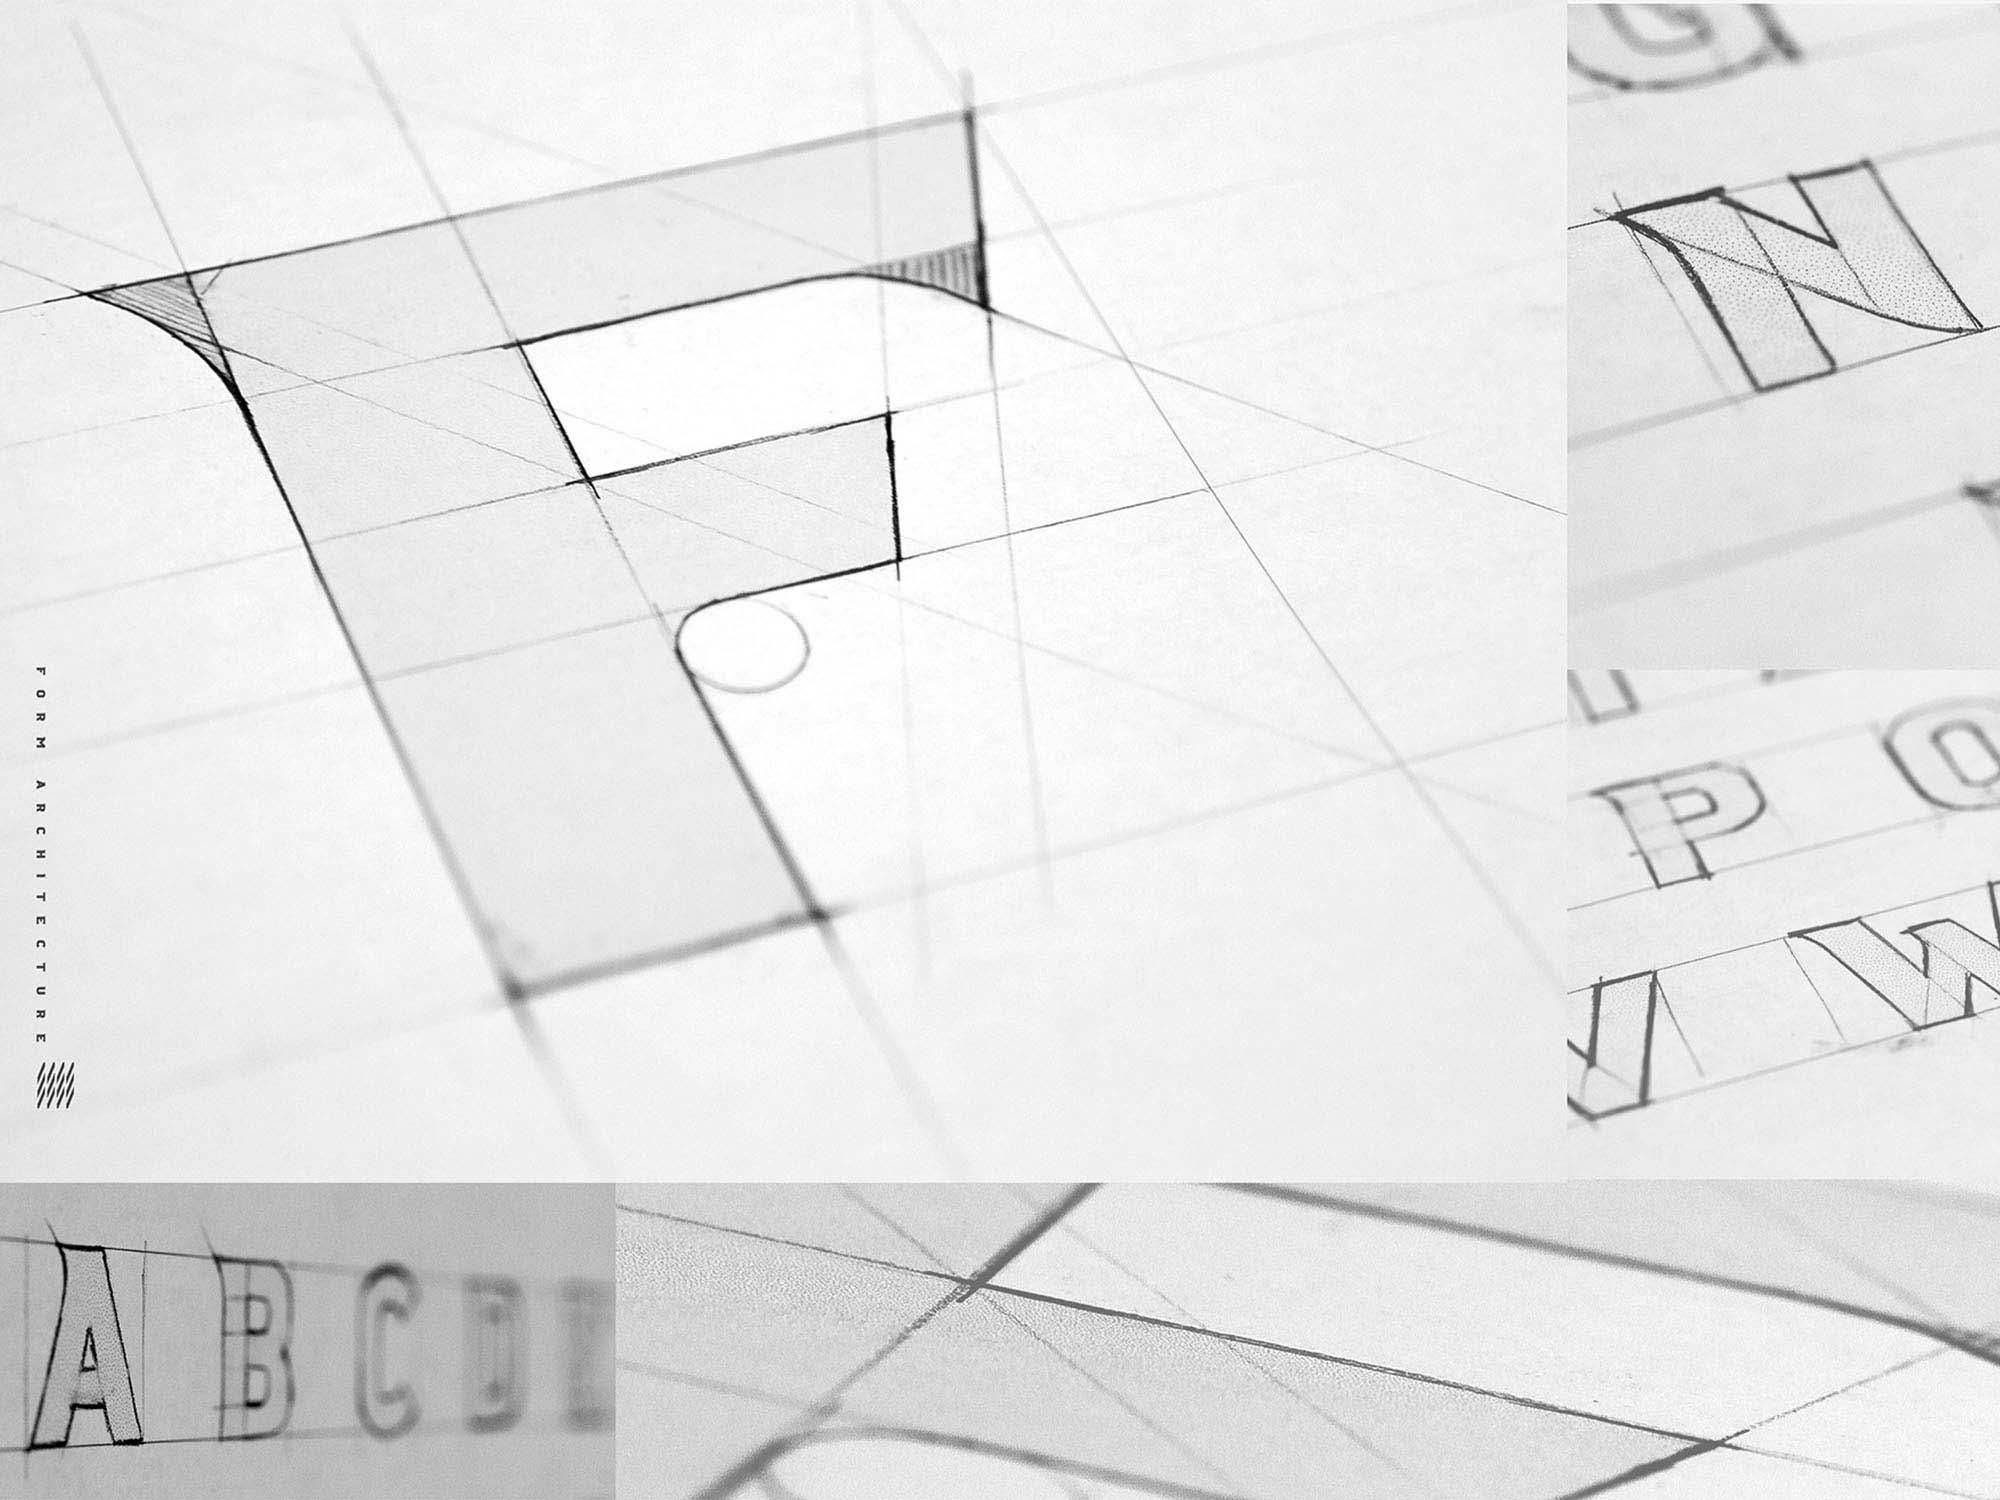 Crossfit Font Sketches